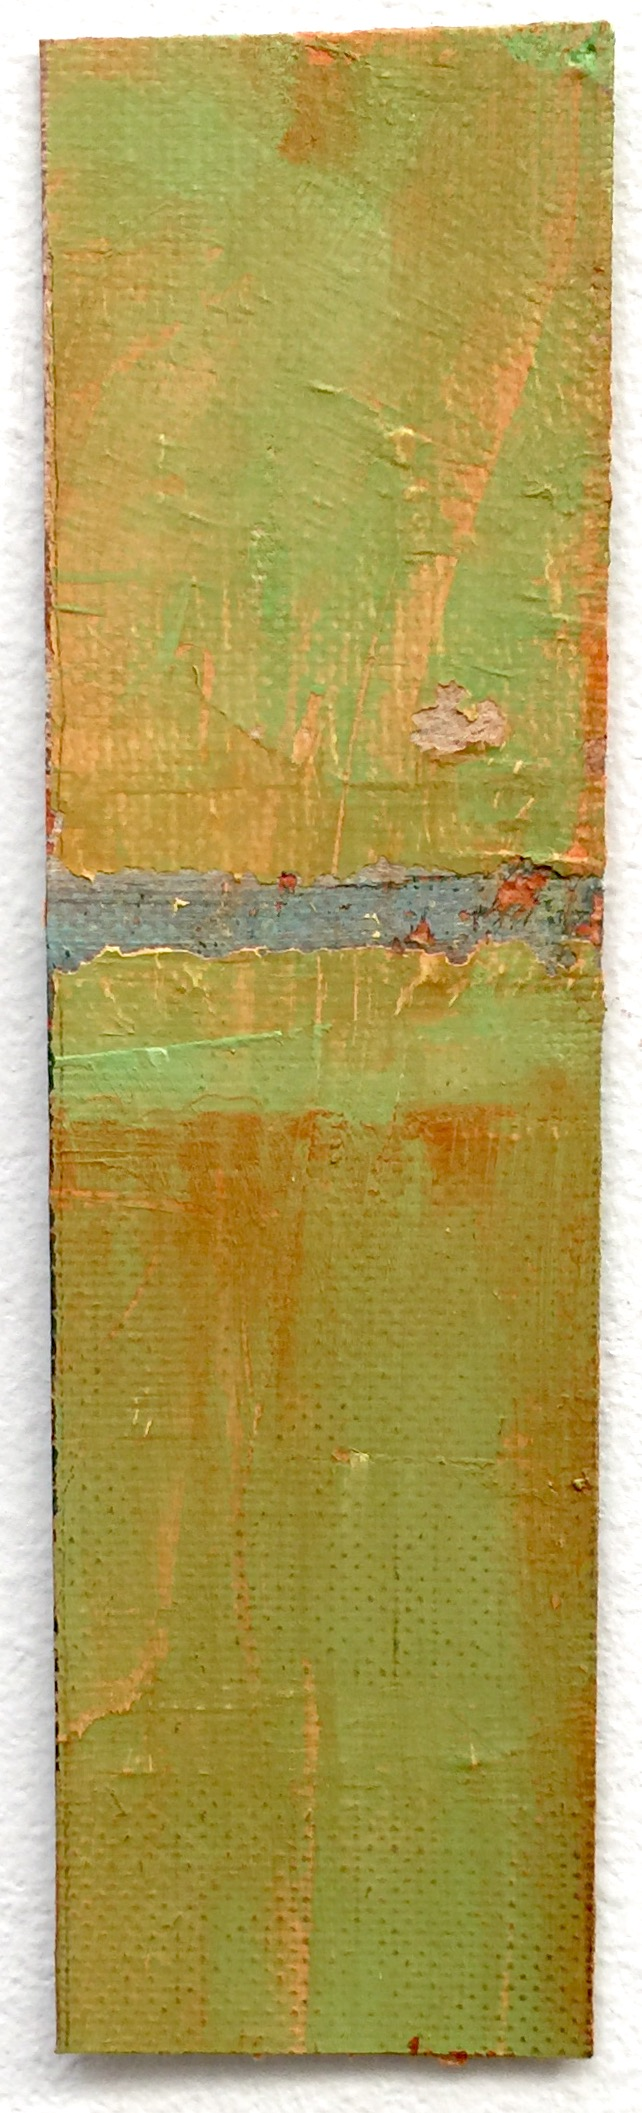 "Ochre Study , 2015, oil on paper, 6.25"" x 1.75"""